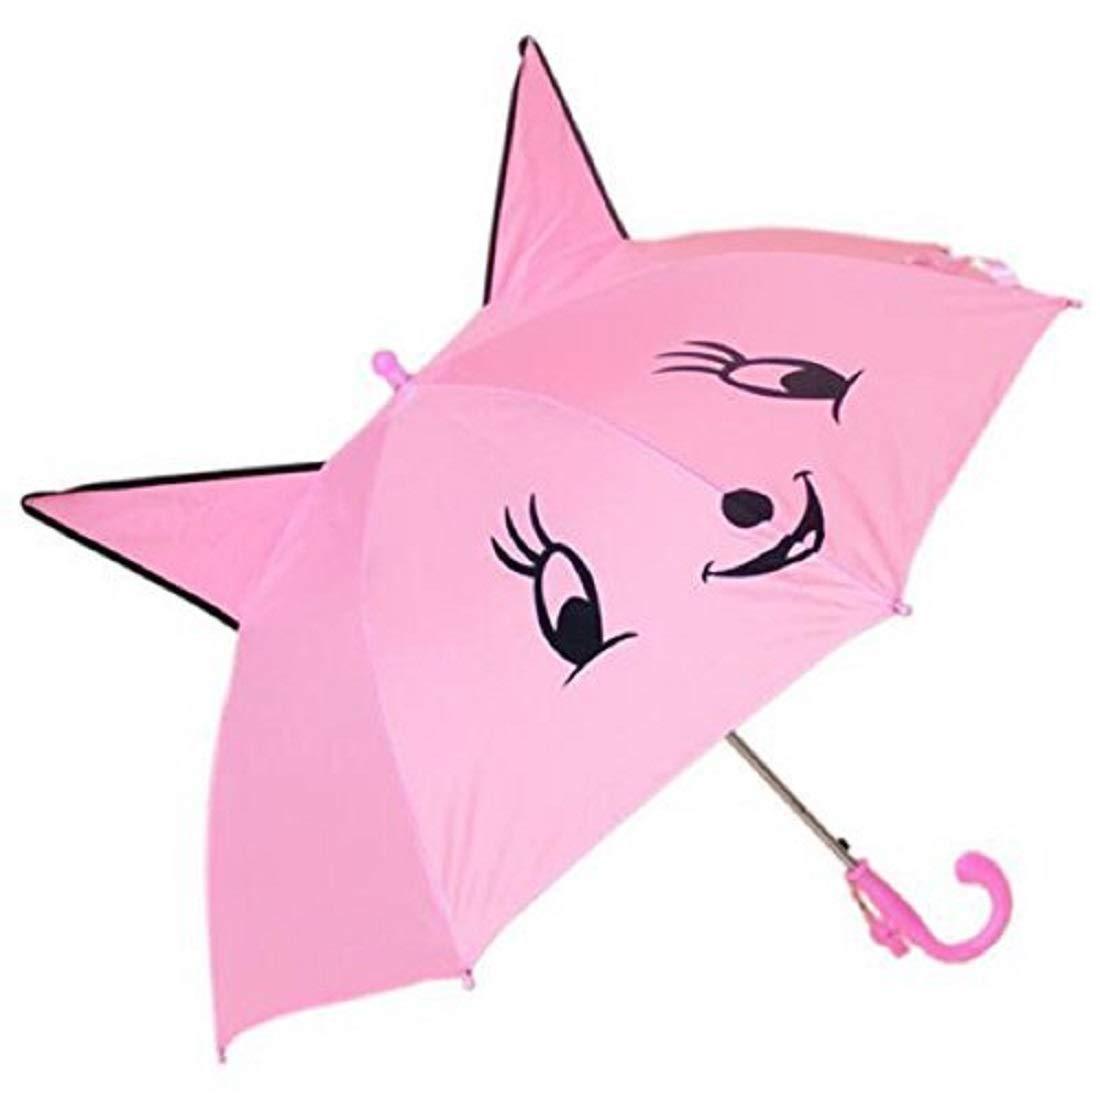 tweety umbrella for kids